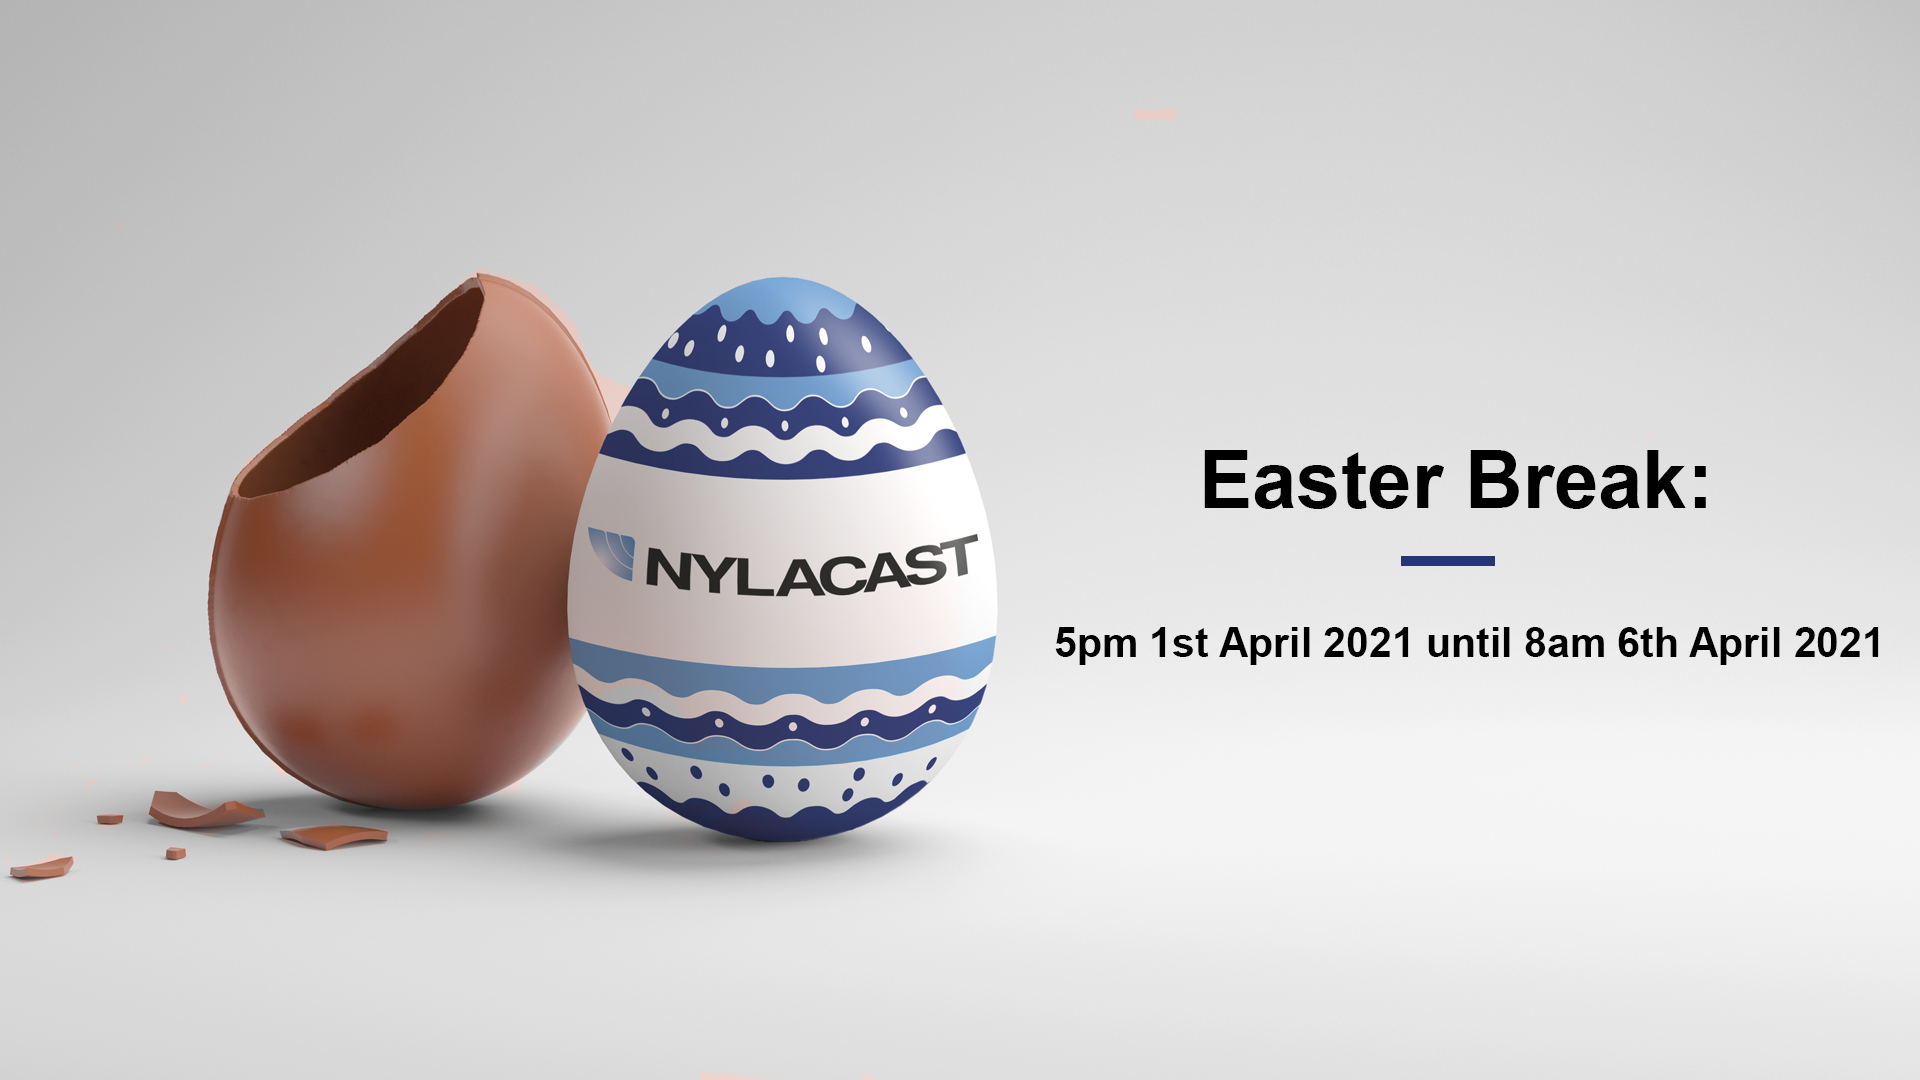 Easter Break Nylacast